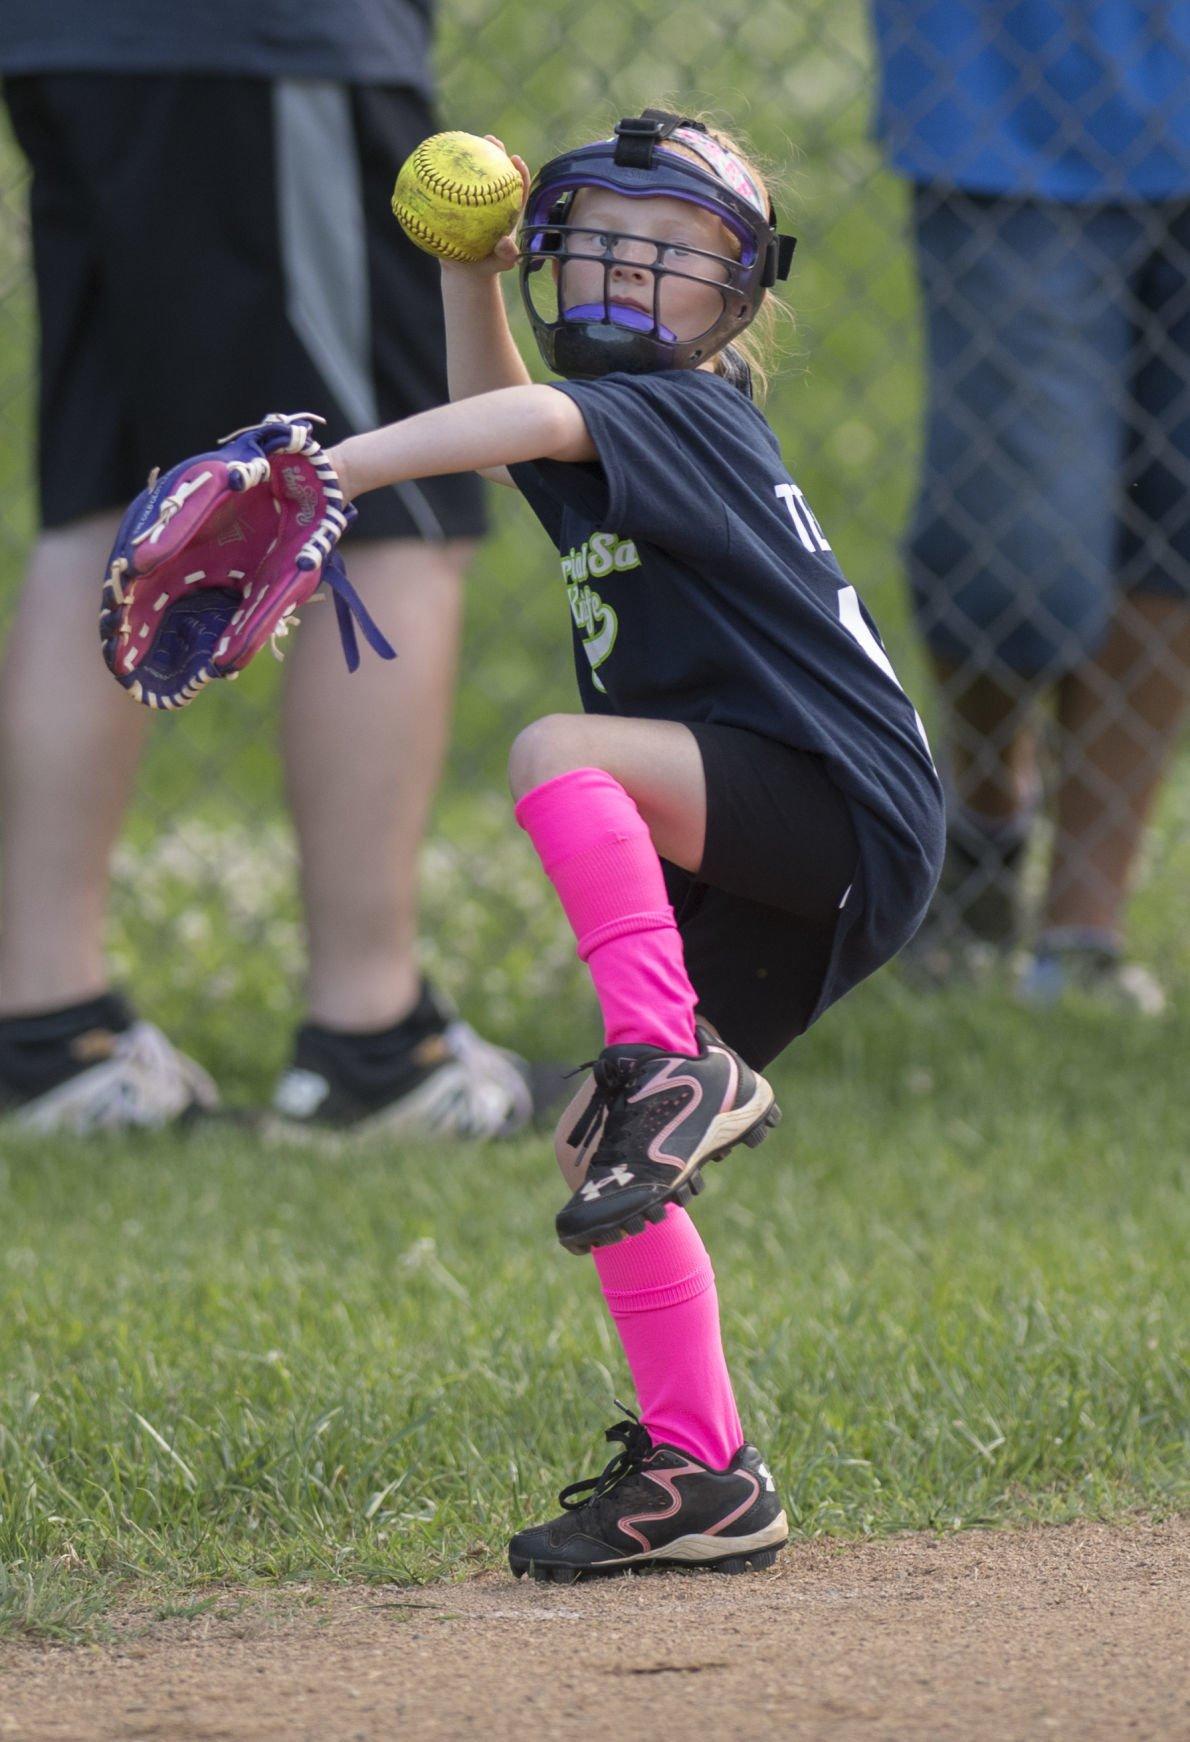 Amherst Sweetees softball team headed to World Series in Alabama